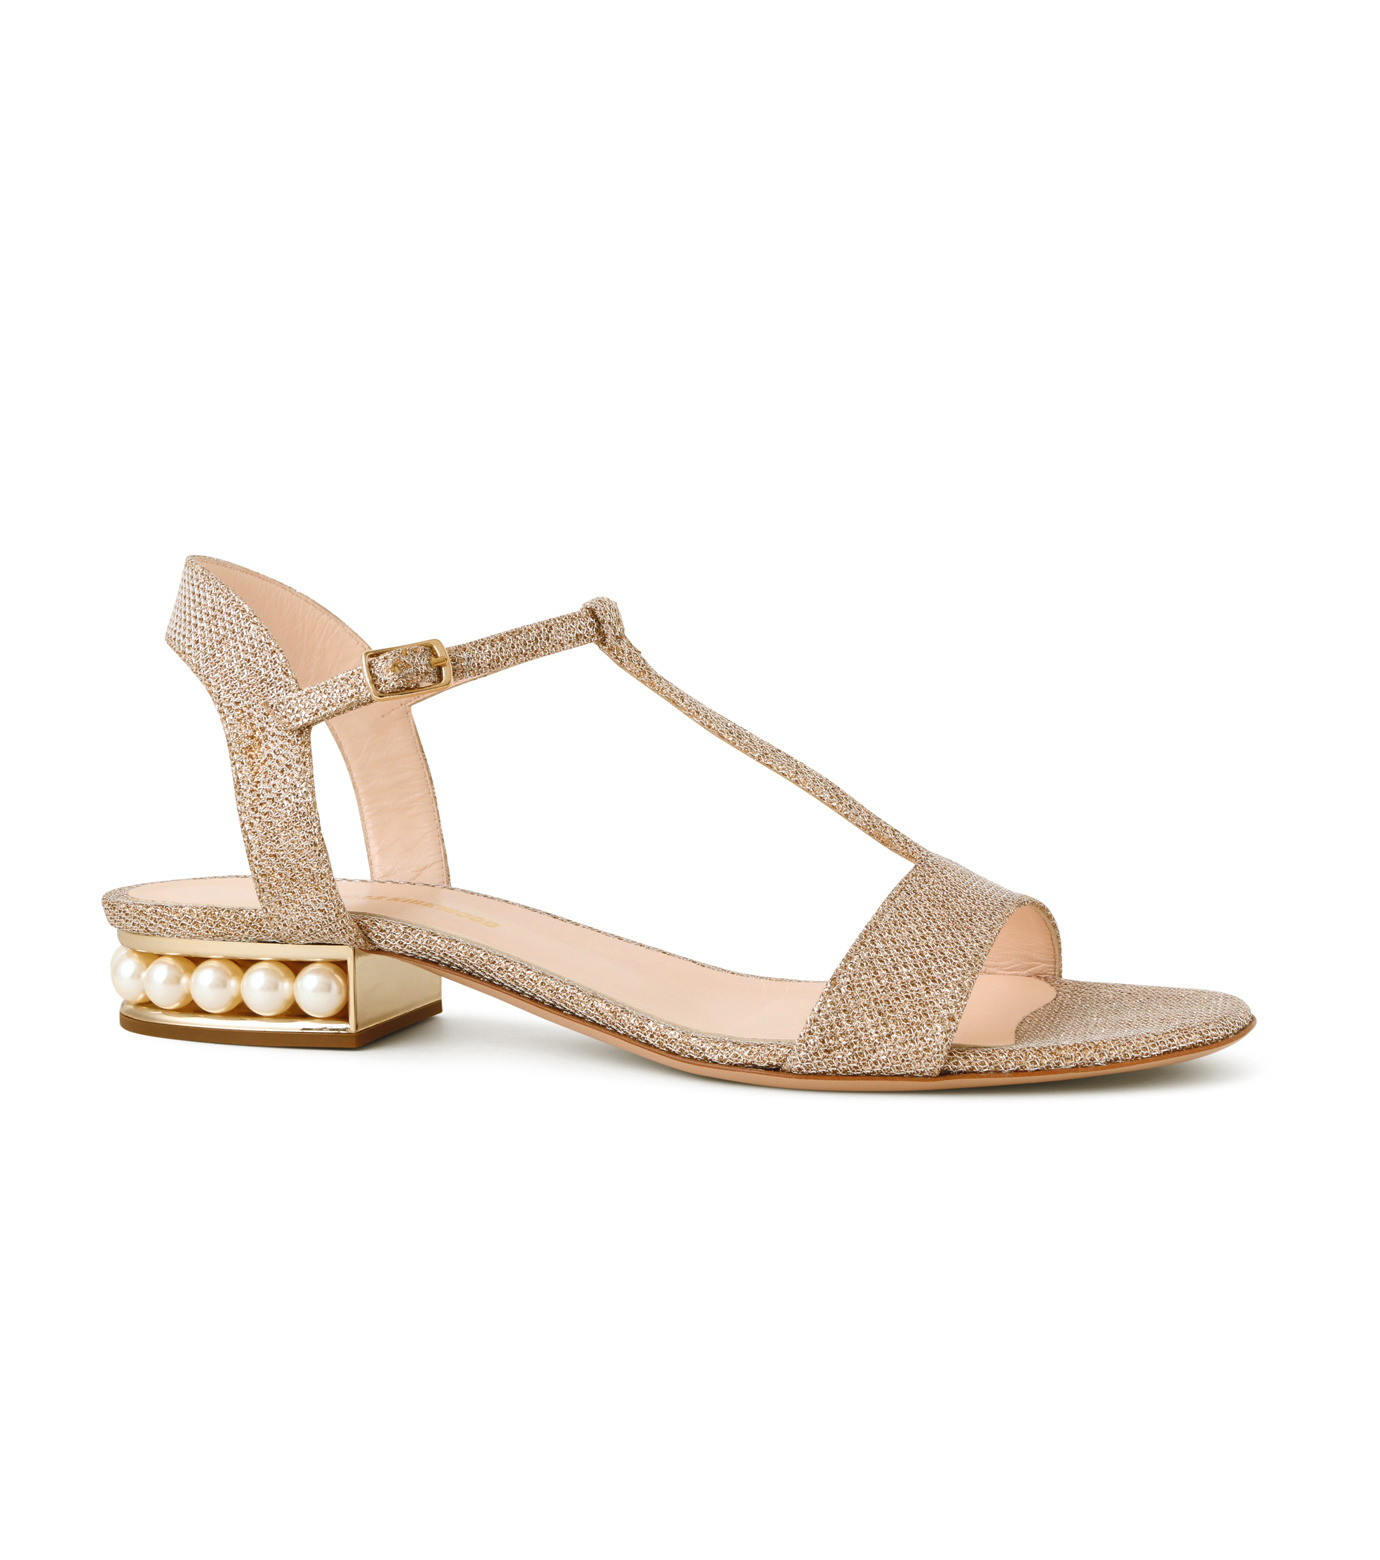 Nicholas  Kirkwood(ニコラス カークウッド)のCasati Pearl Sandal-GOLD(フラットシューズ/Flat shoes)-16S0451-2 拡大詳細画像1